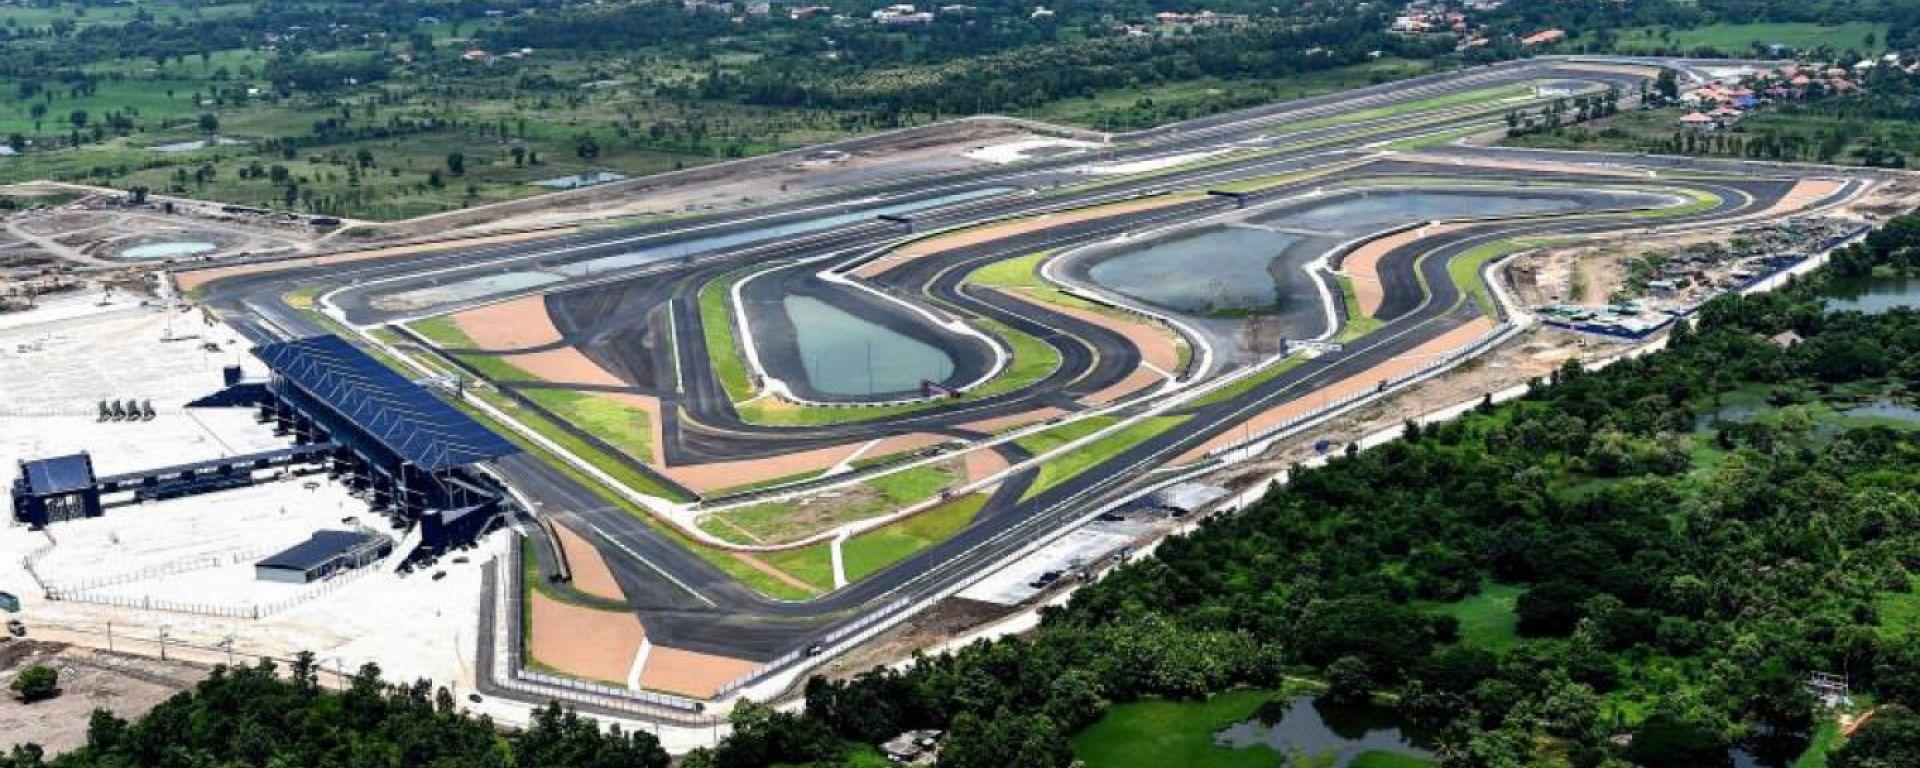 Il Chang International Circuit di Buriram, Thailandia